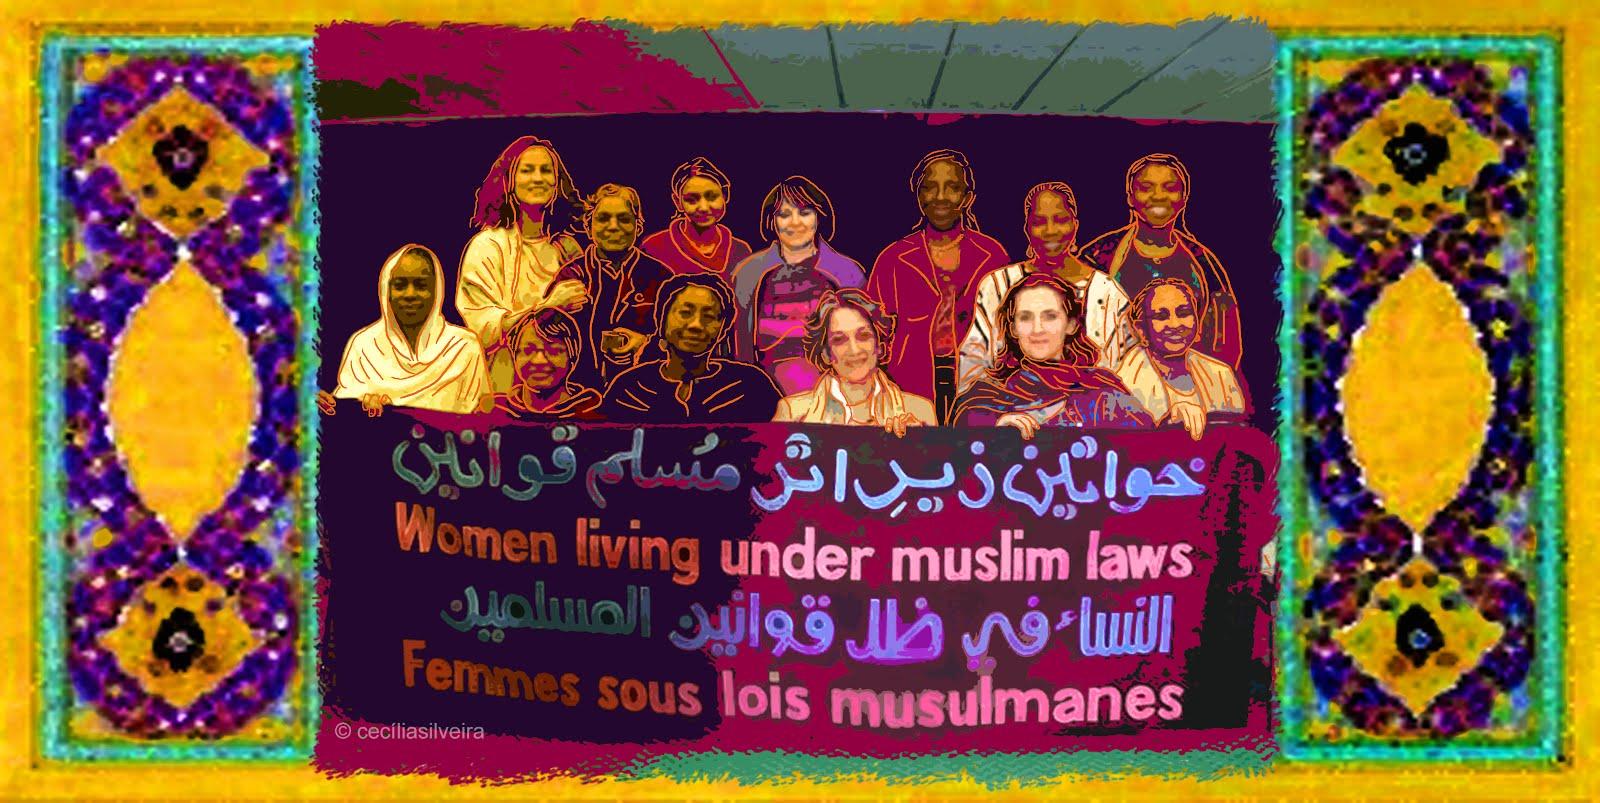 wluml-feminismo-no-oriente-medio-ceciliasilveira.jpg